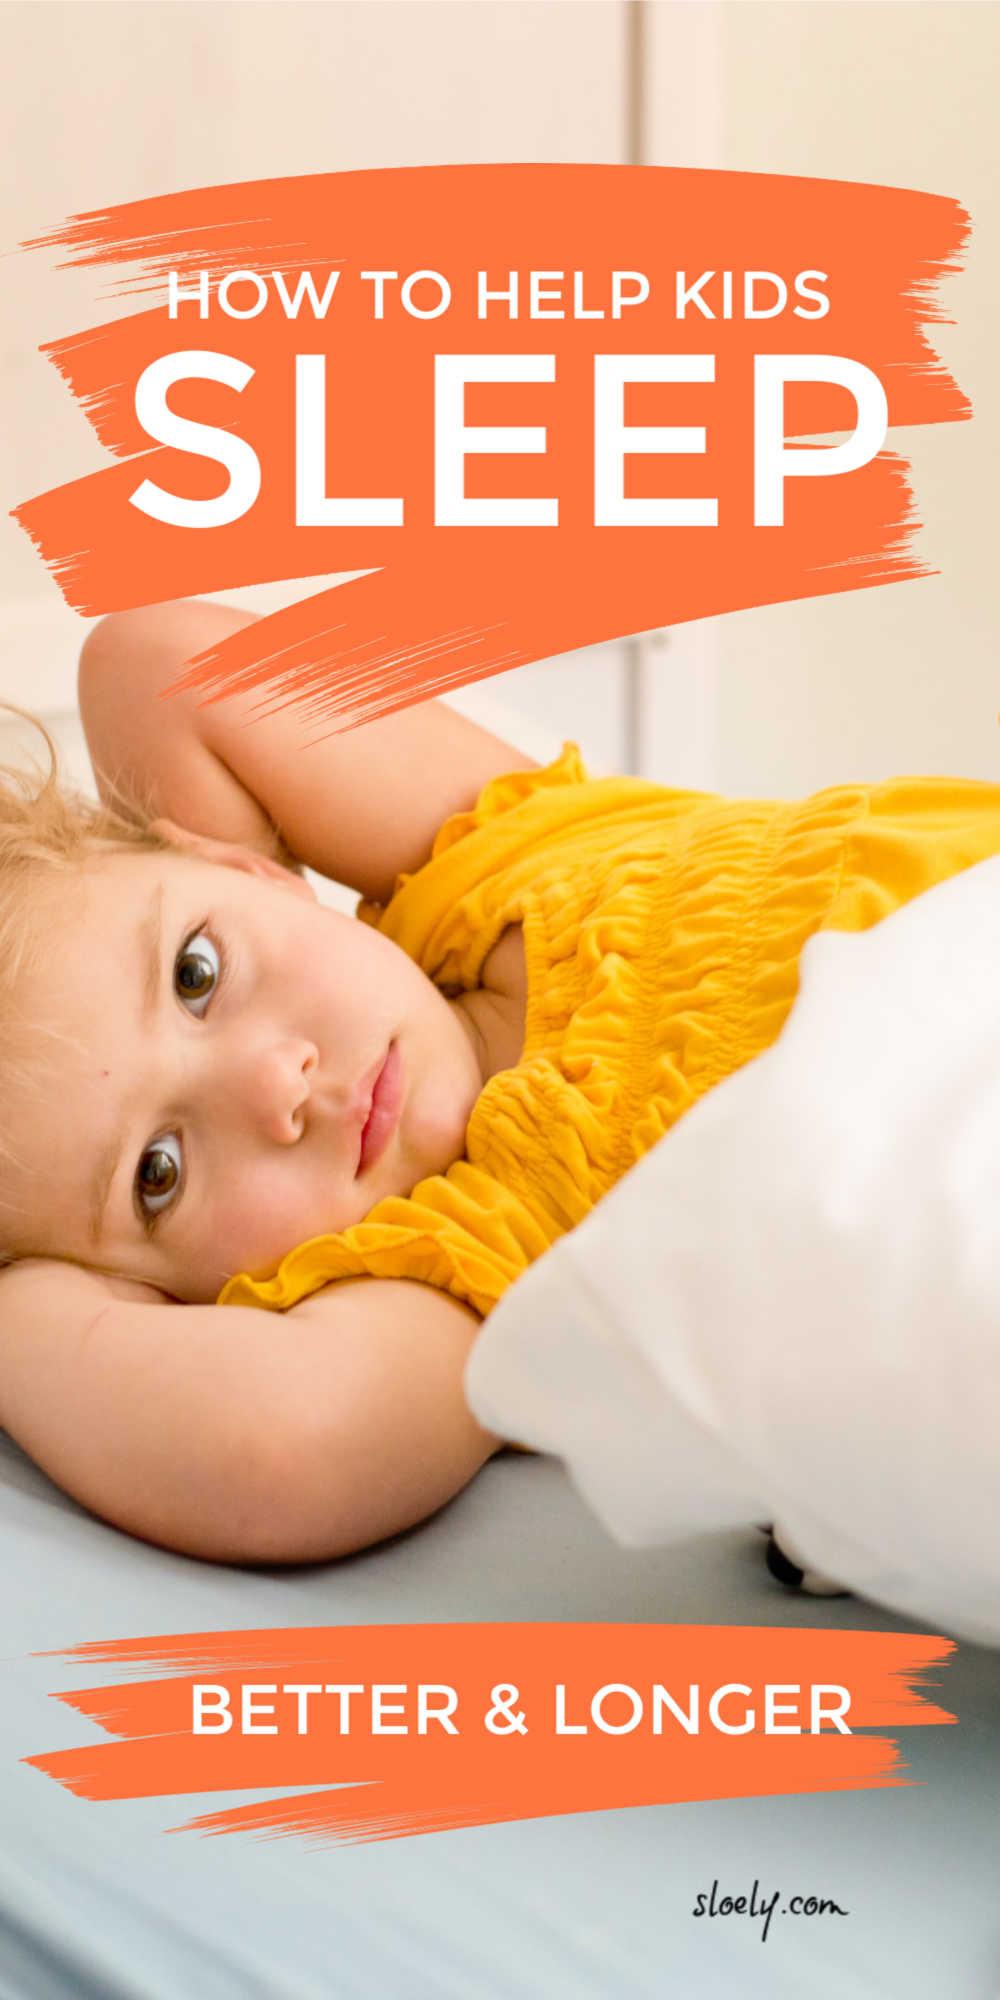 How To Help Kids Sleep Better and Longer